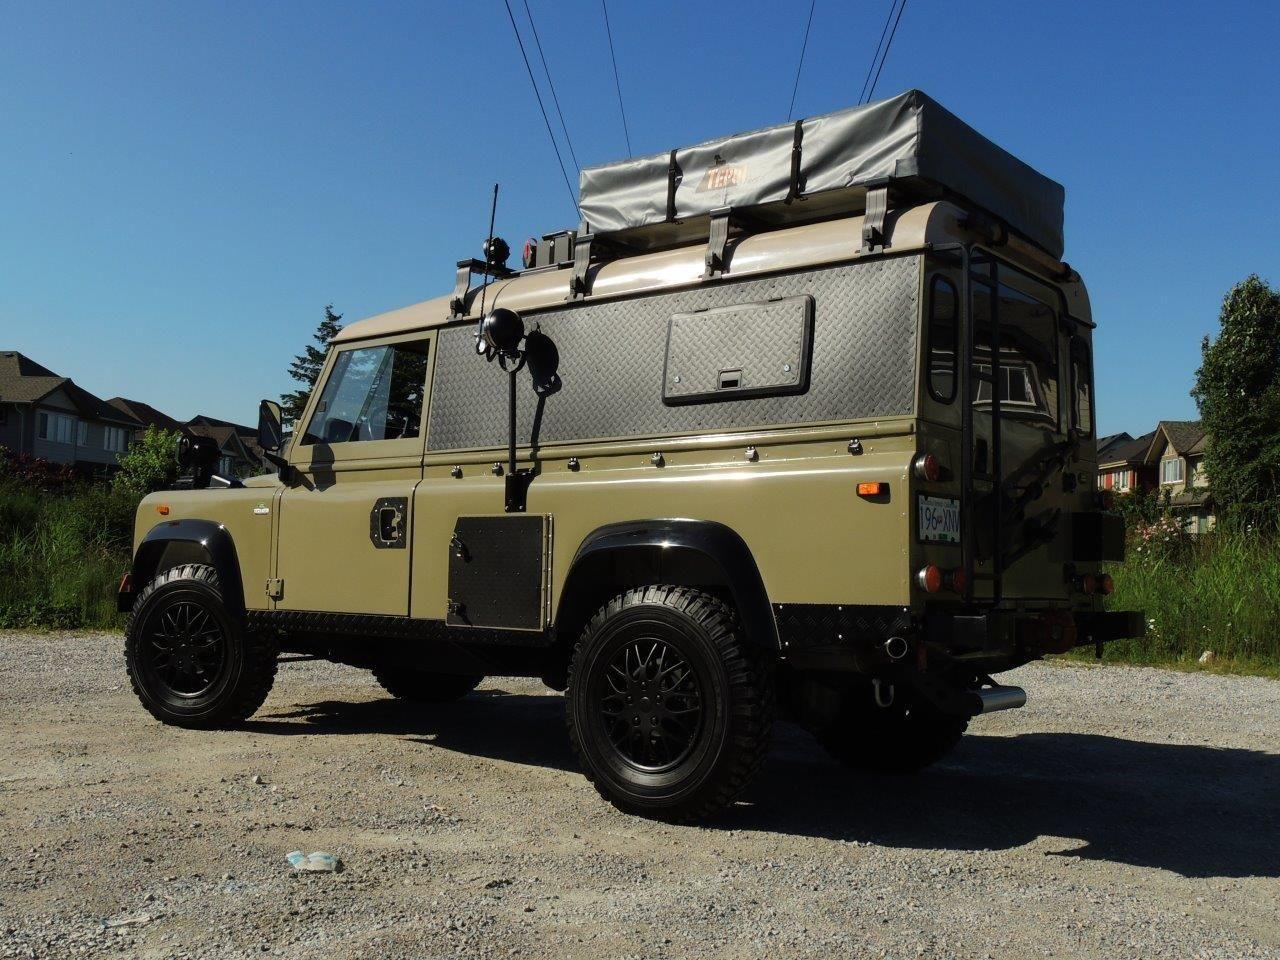 1990 land rover defender 110 expedition overland classic. Black Bedroom Furniture Sets. Home Design Ideas